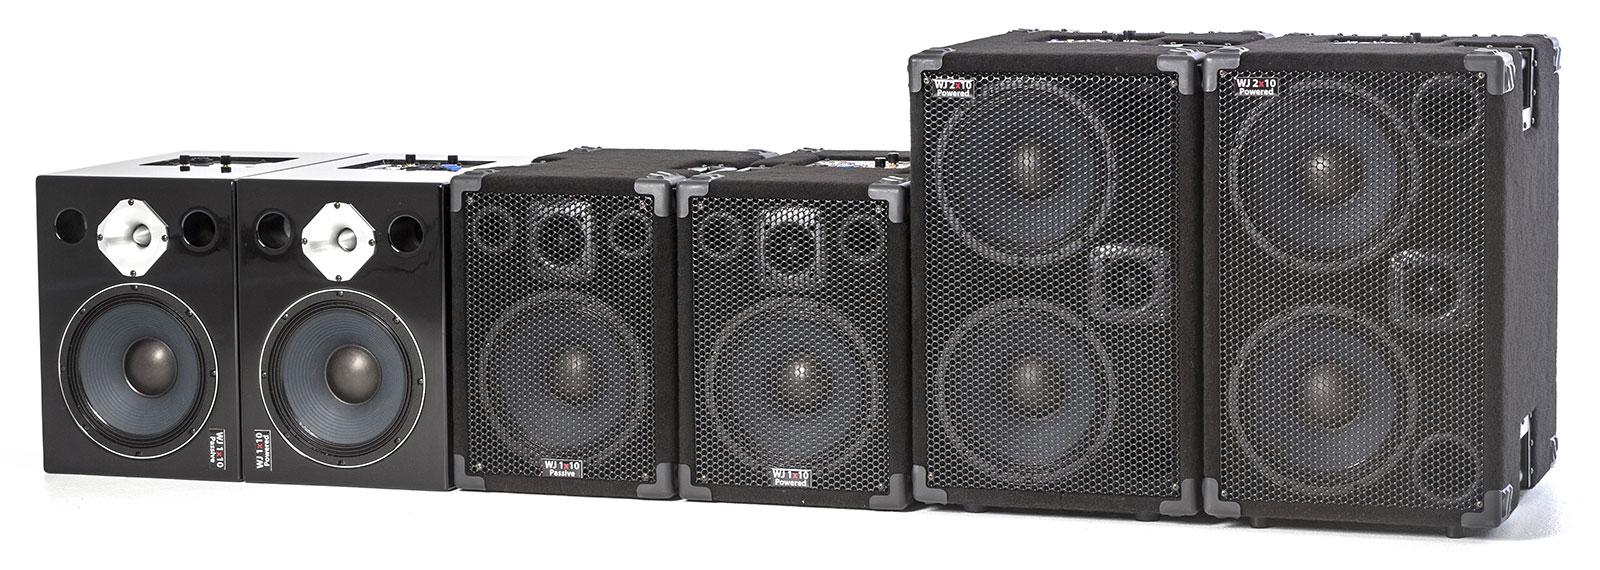 Wayne Jones Audio Hi Powered, Hi End Bass Cabinets & Hi Fi Studio Monitors - Product Range